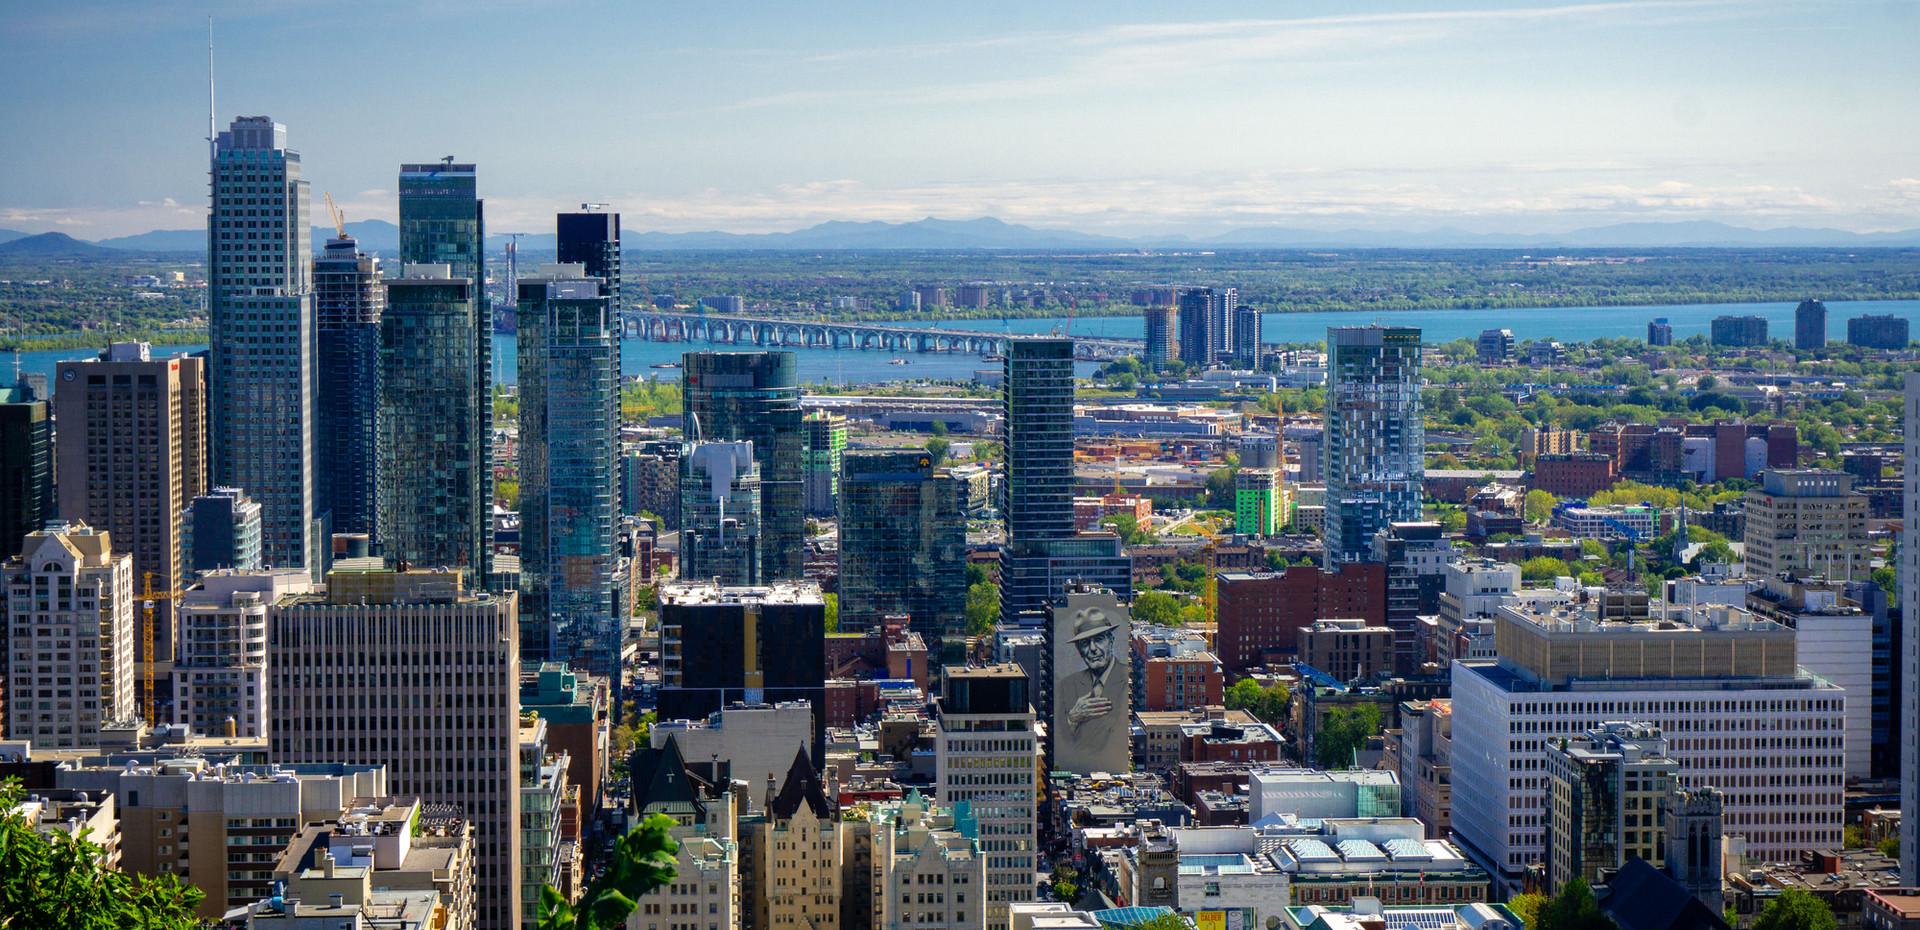 Explore charming and cosmopolitan city streets – Quebec's metropolis